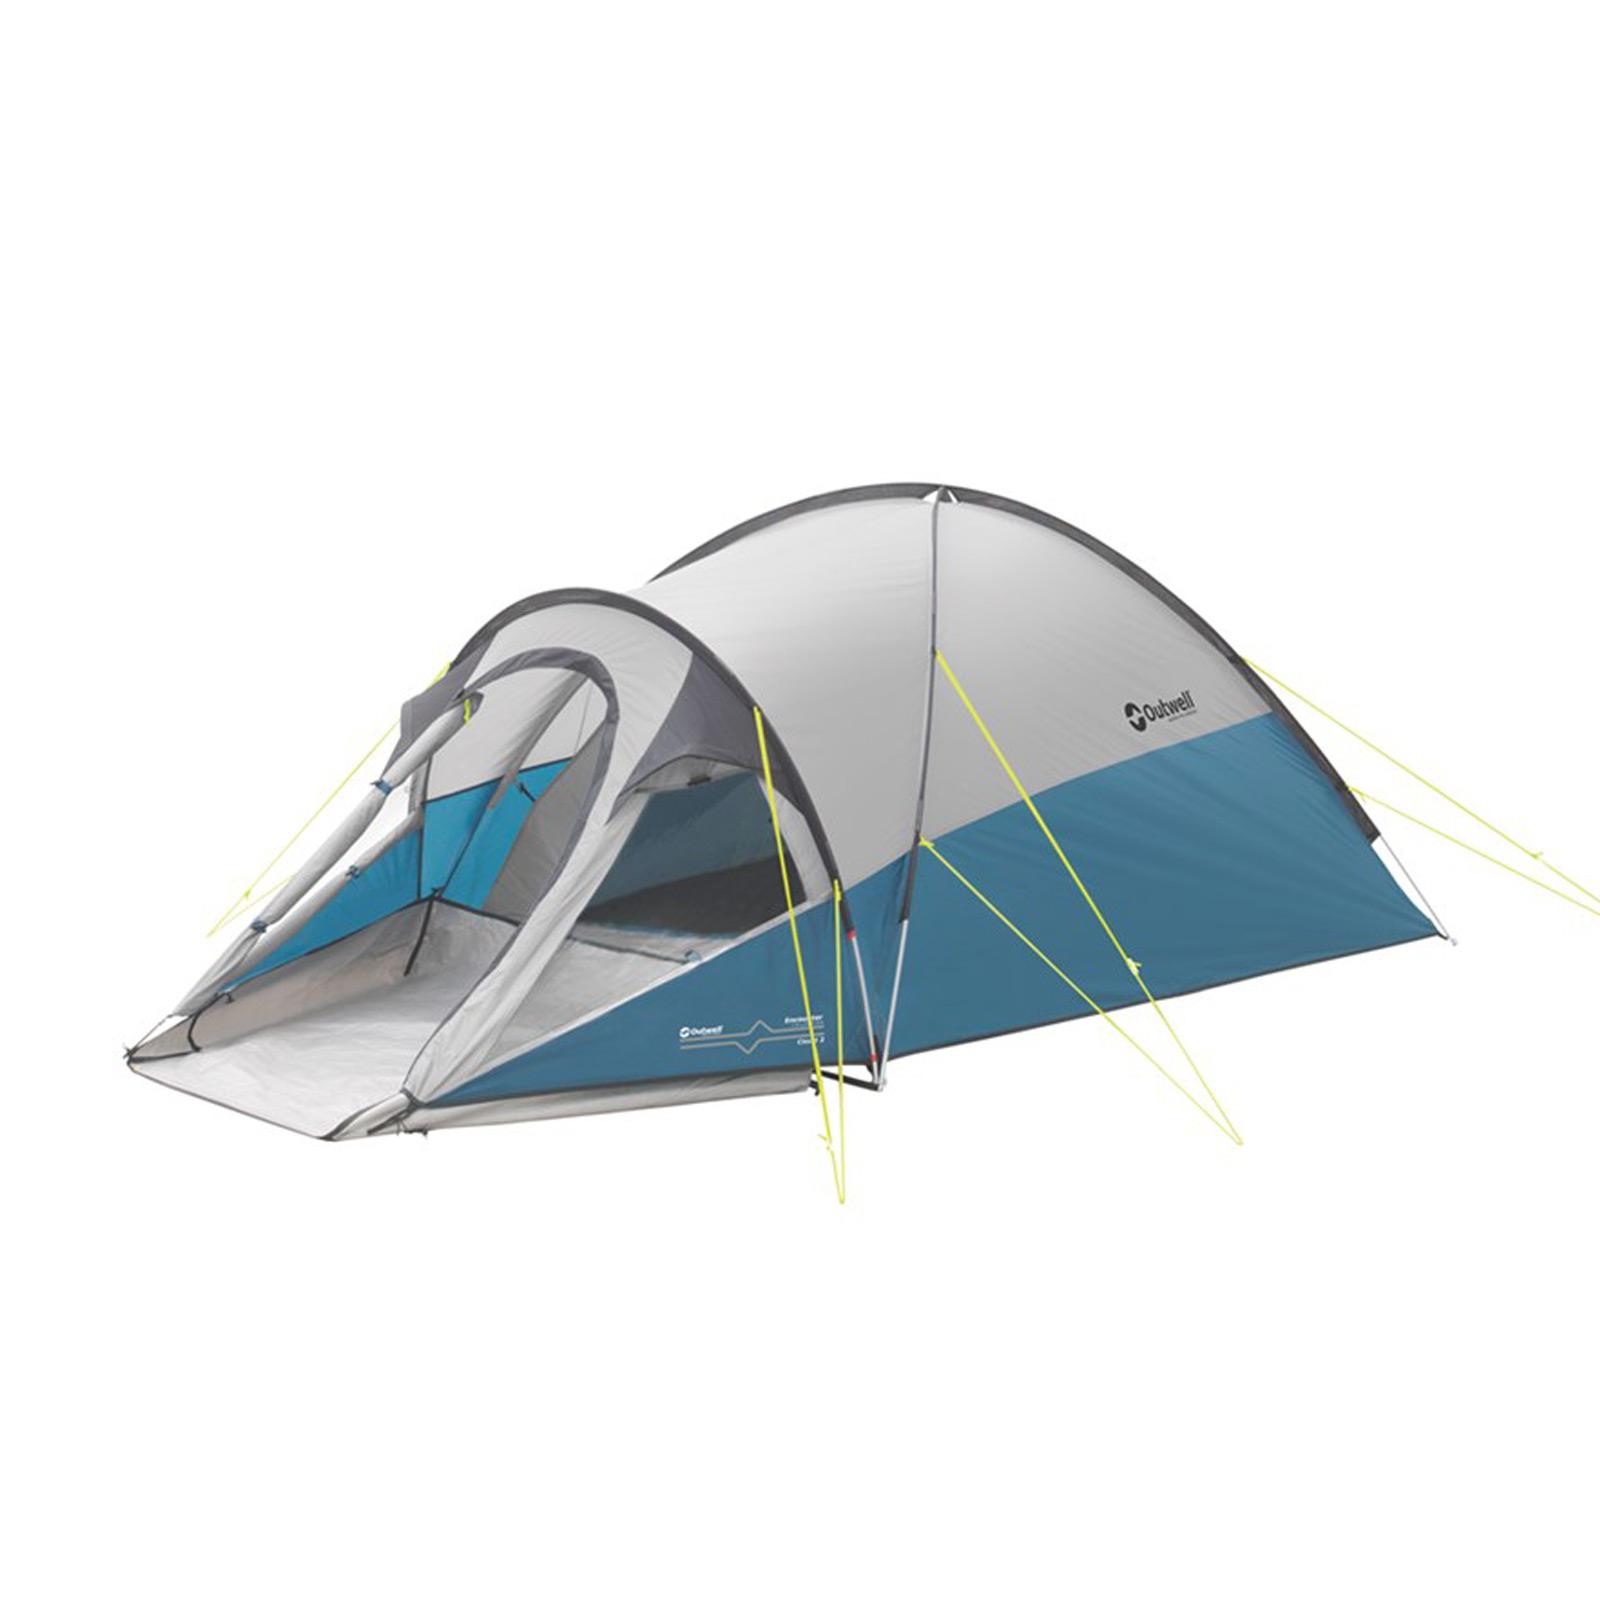 igluzelt 2 personen outwell zelt cloud 2 mann iglu. Black Bedroom Furniture Sets. Home Design Ideas